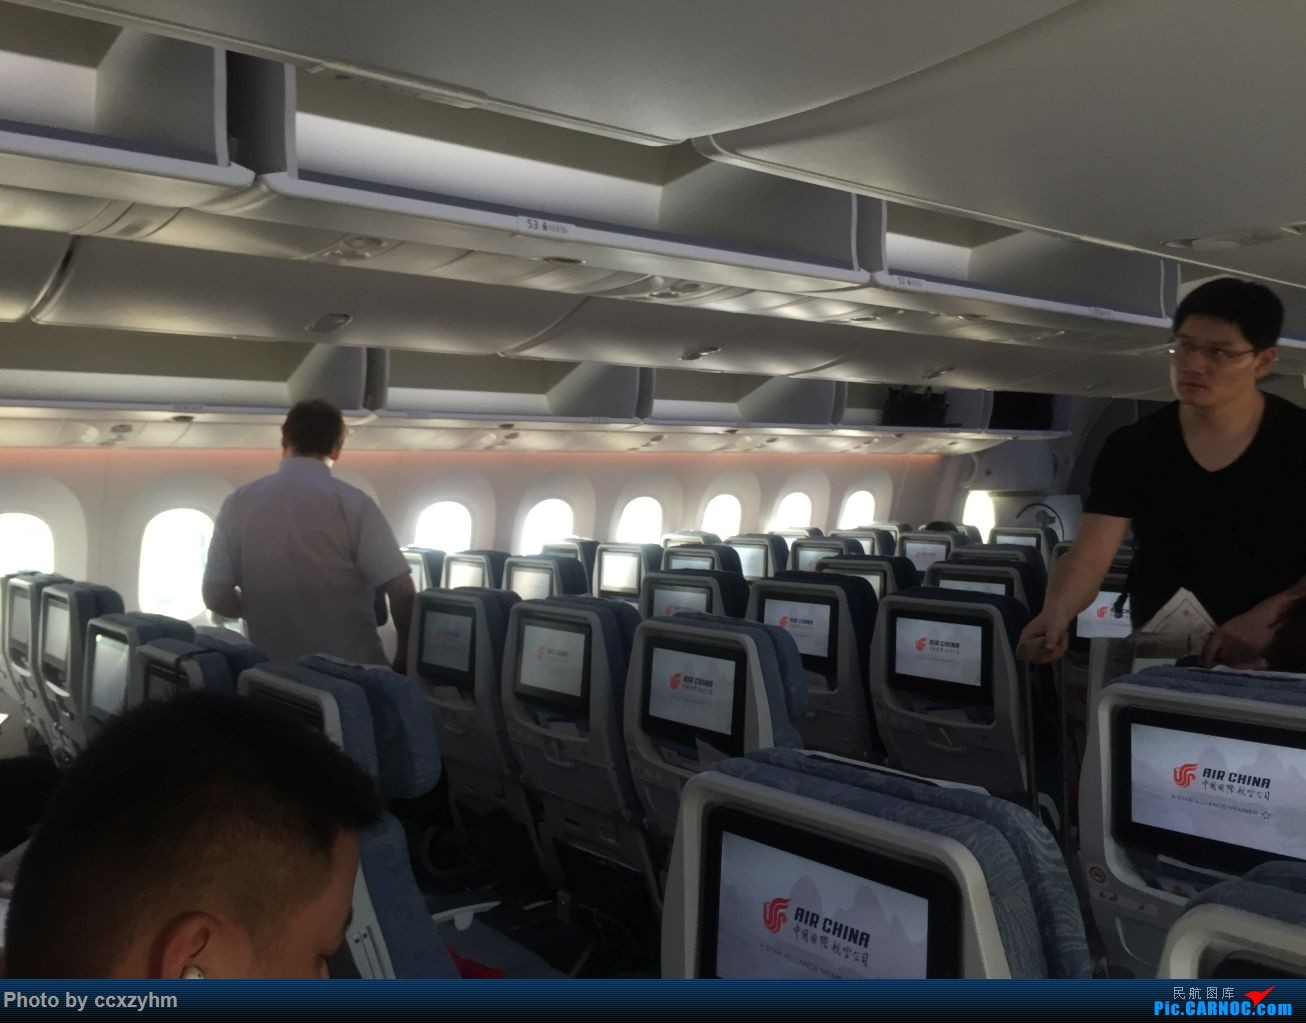 Re:[原创]论坛首发 京沪线上的国航789 高二升高三暑假短Break 空铁联运去北京 BOEING 787-9 B-7877 中国上海虹桥国际机场